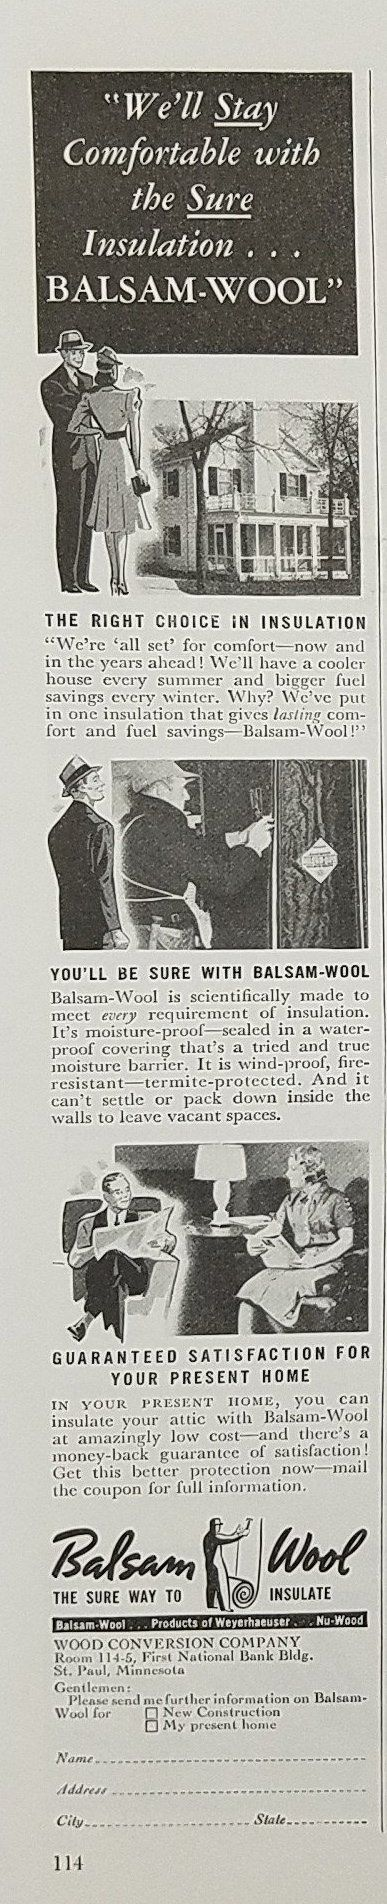 1939 Balsam Wool Insulation Vintage Ad